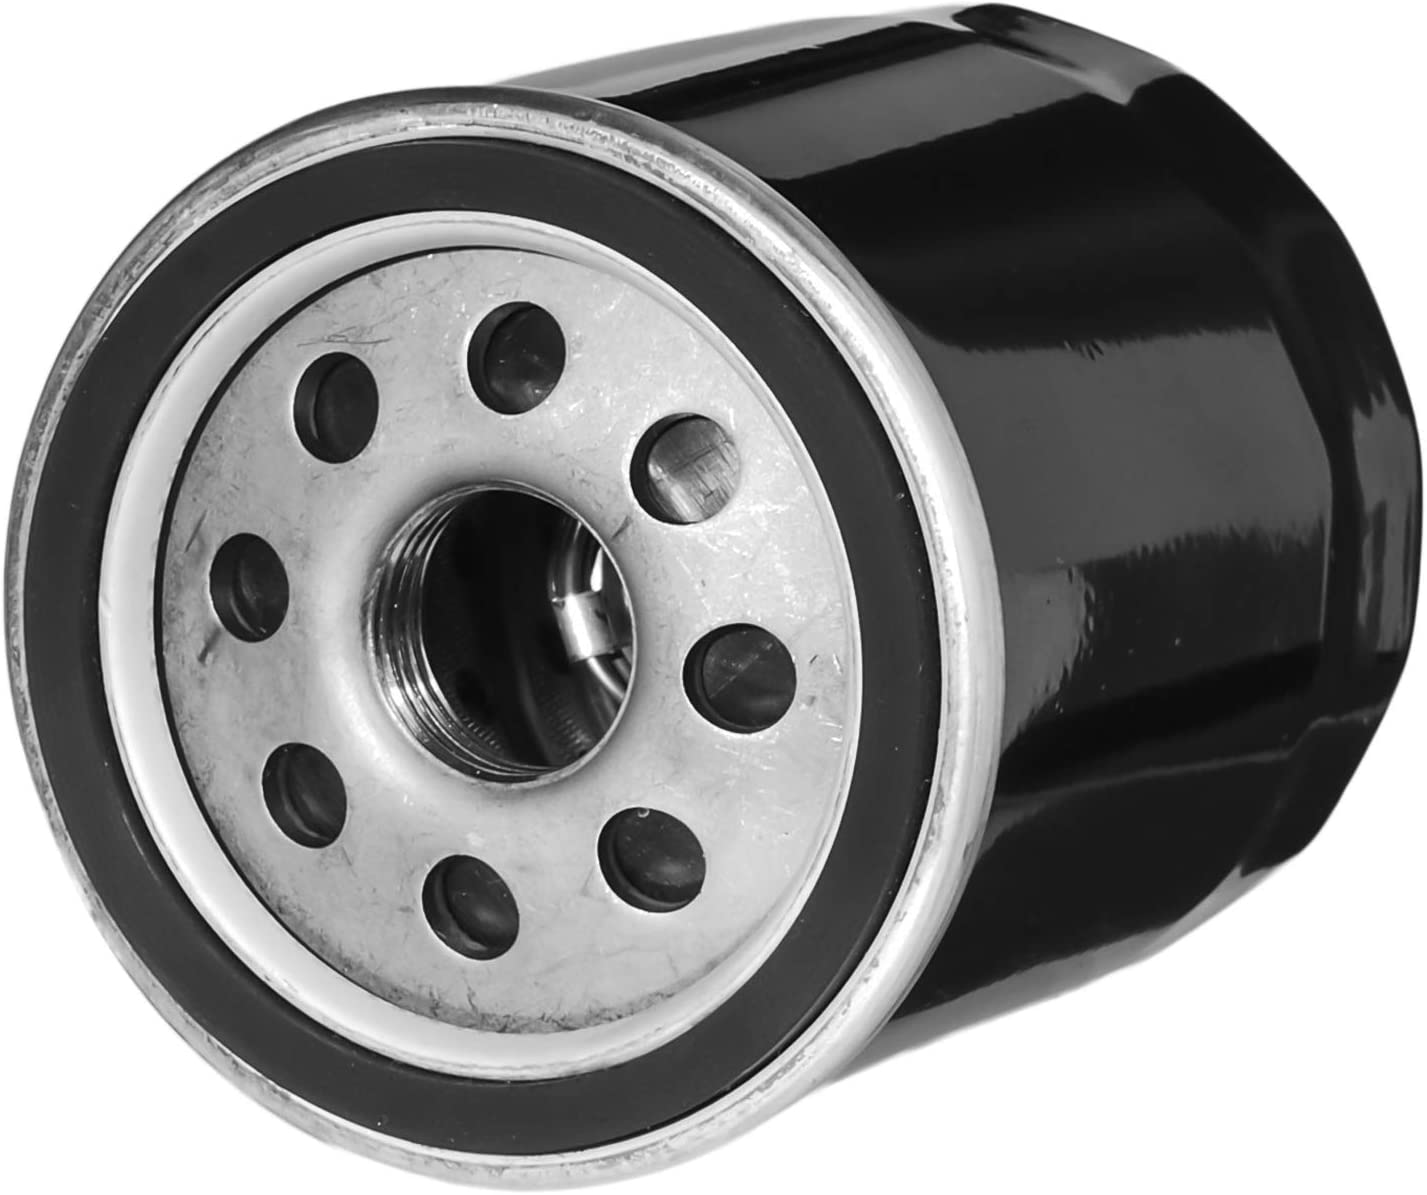 HIFROM 11013-7038 Air Filter Fuel Filter Spark Plug Oil Filter Kit for Kawasaki FX751V FX801V FX850V FX921V FX1000V John Deere Z830A Z850A Z860A Z925 Z930 Z950 Z960 Z970